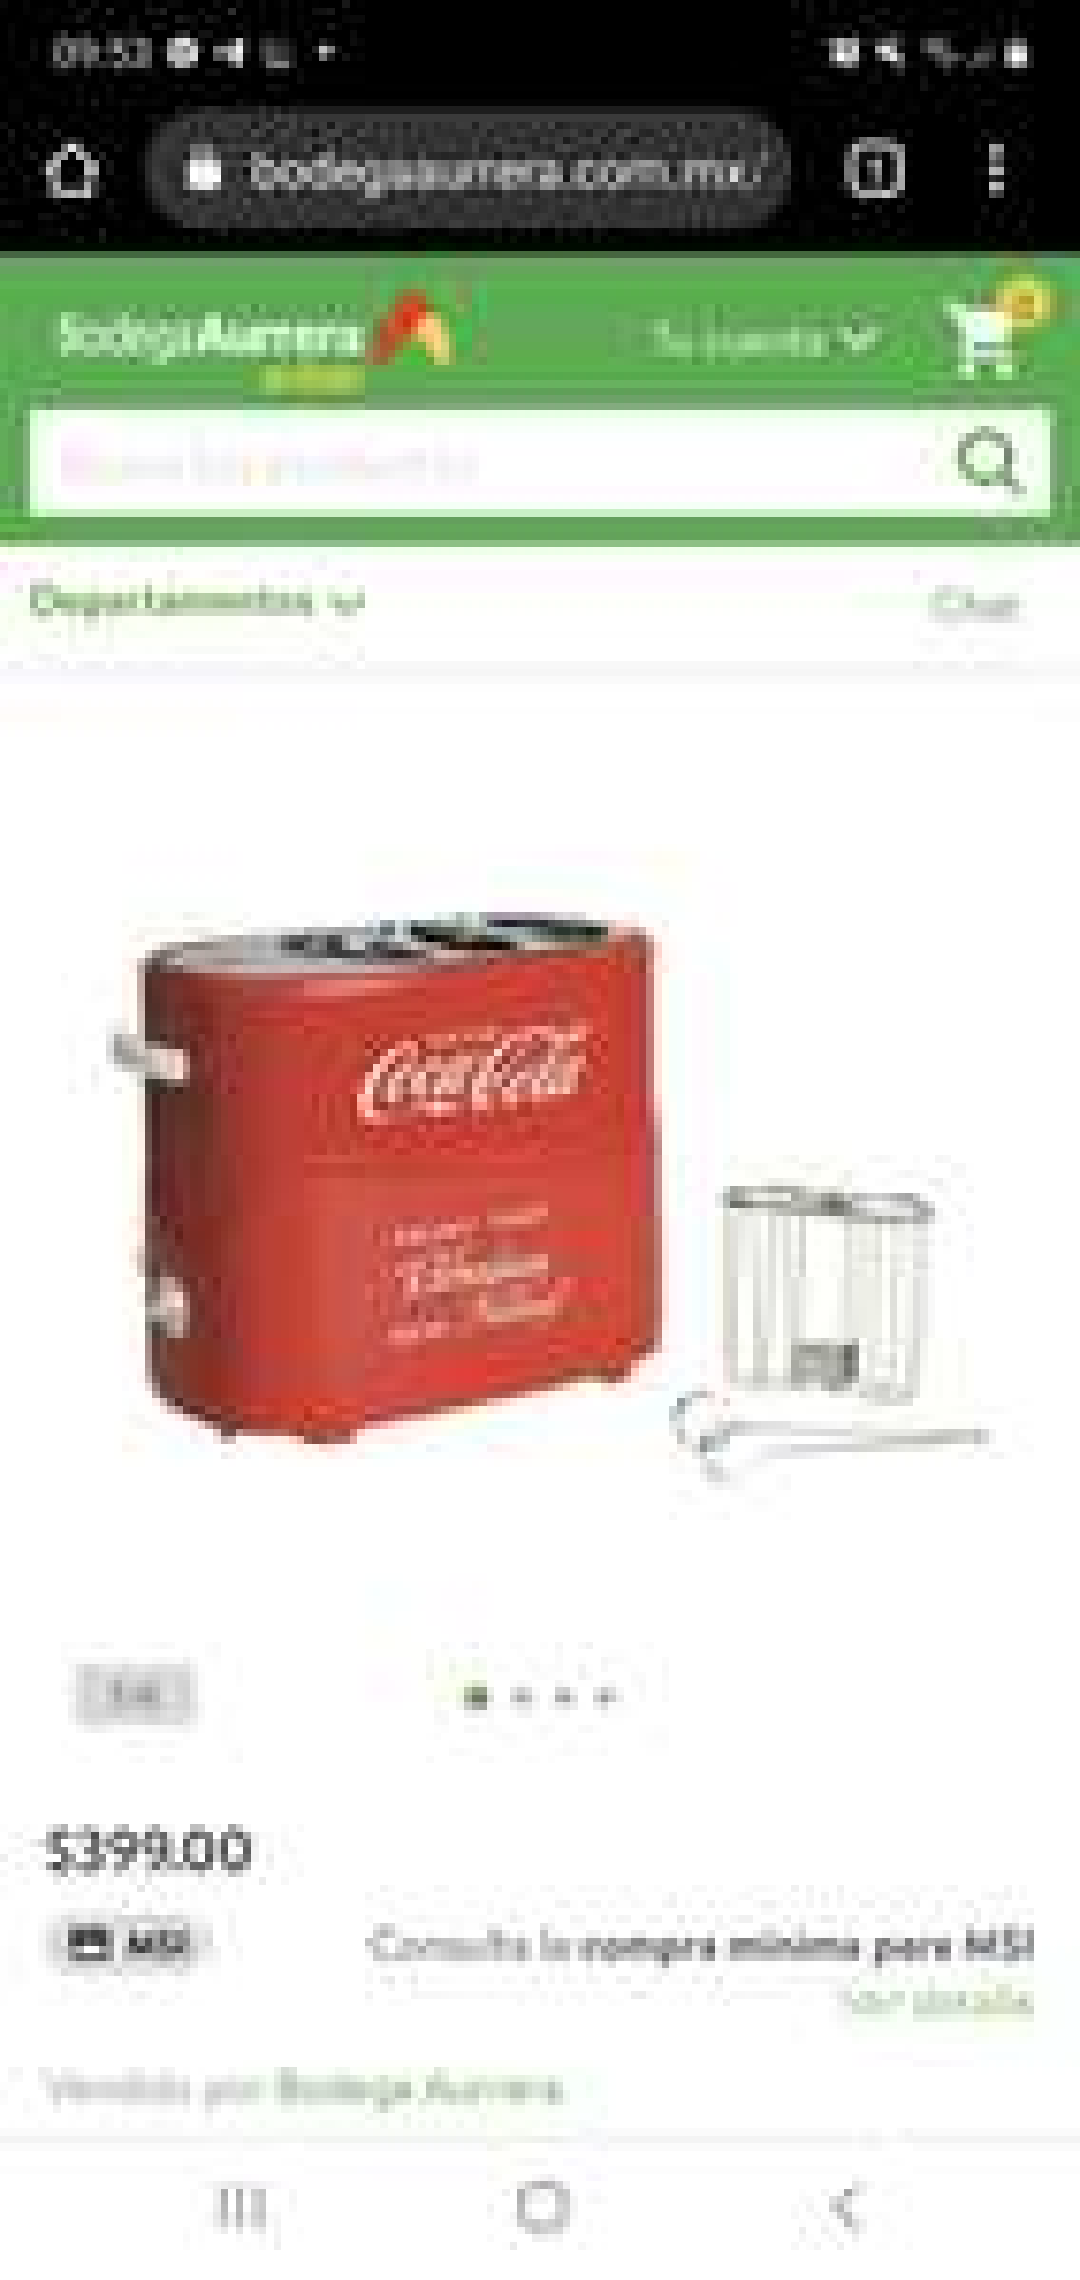 Bodega Aurrerá: Maquina Hot Dog Coca Cola